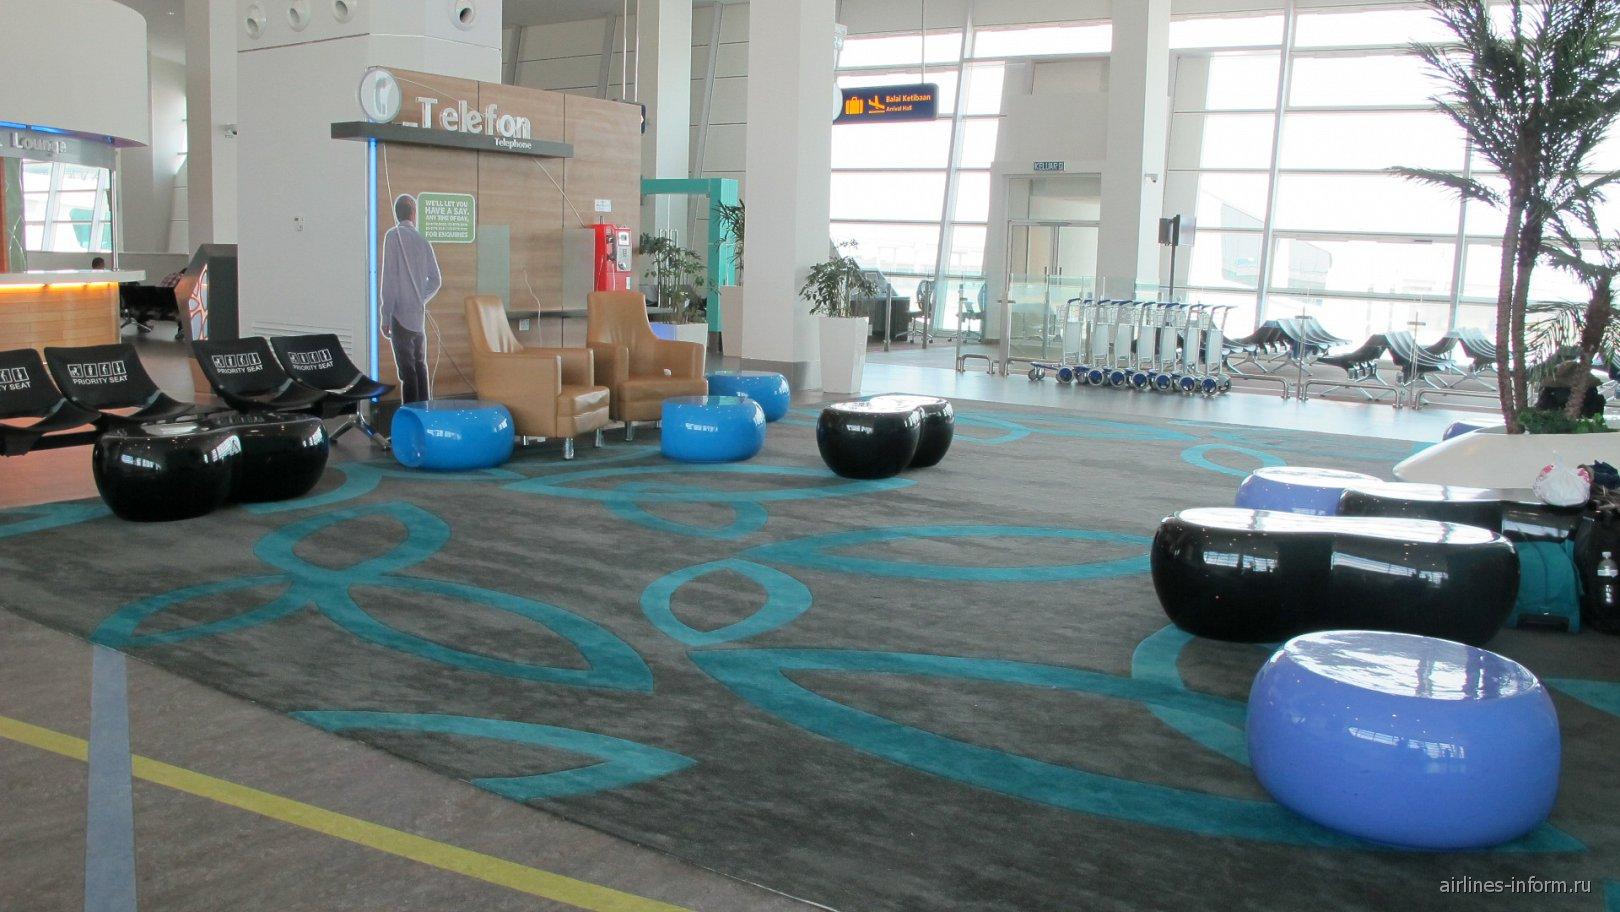 Зона релакса в лоукост-терминале KLIA2 аэропорта Куала-Лумпур